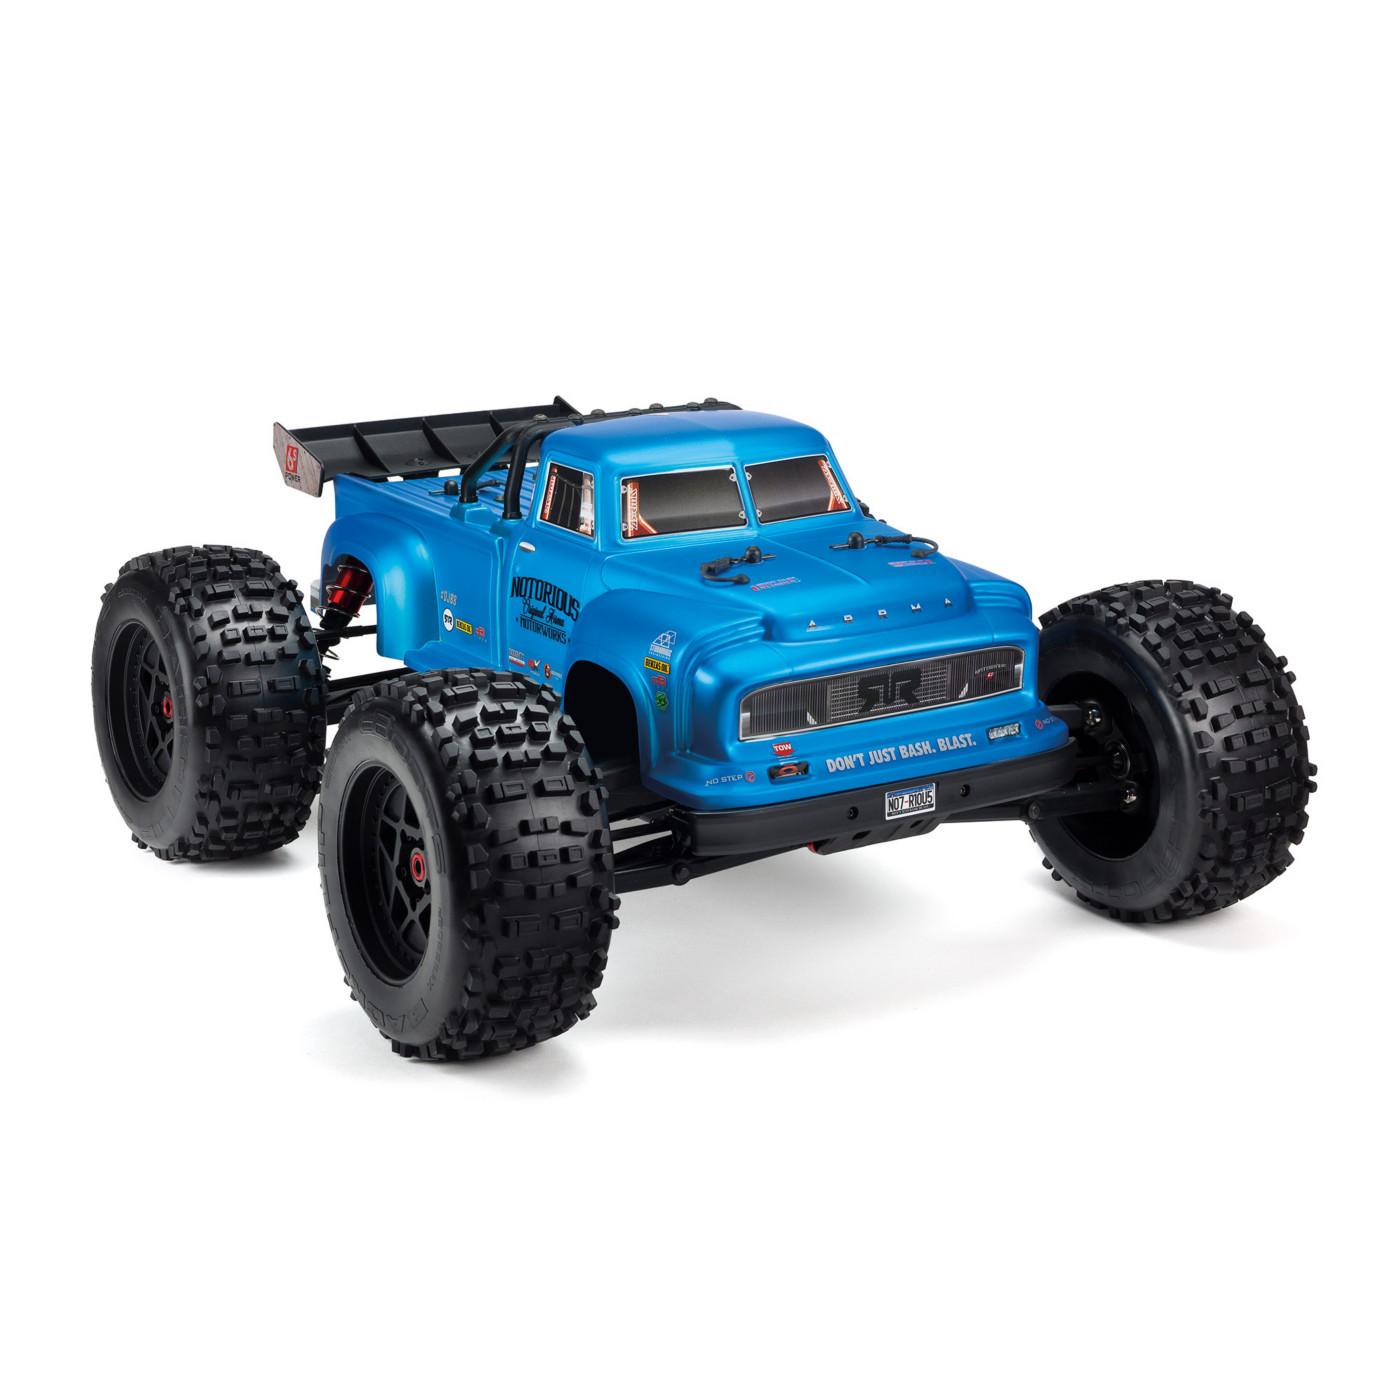 ARRMA 1/8 NOTORIOUS 6S BLX Stunt Truck RTR